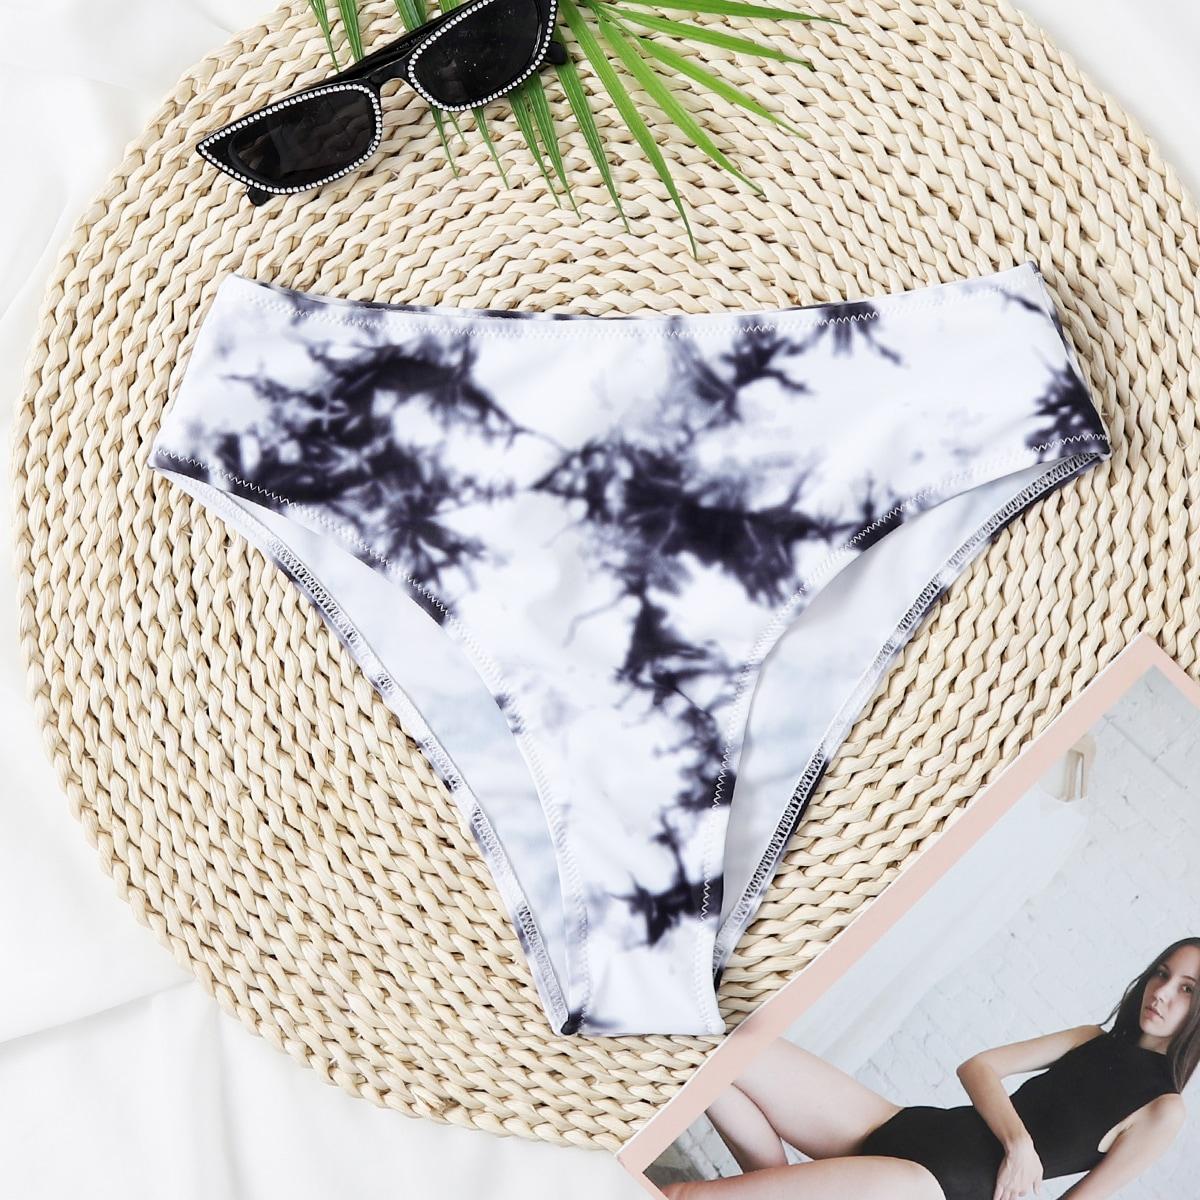 SHEIN / Tie Dye High Waisted Bikini Panty